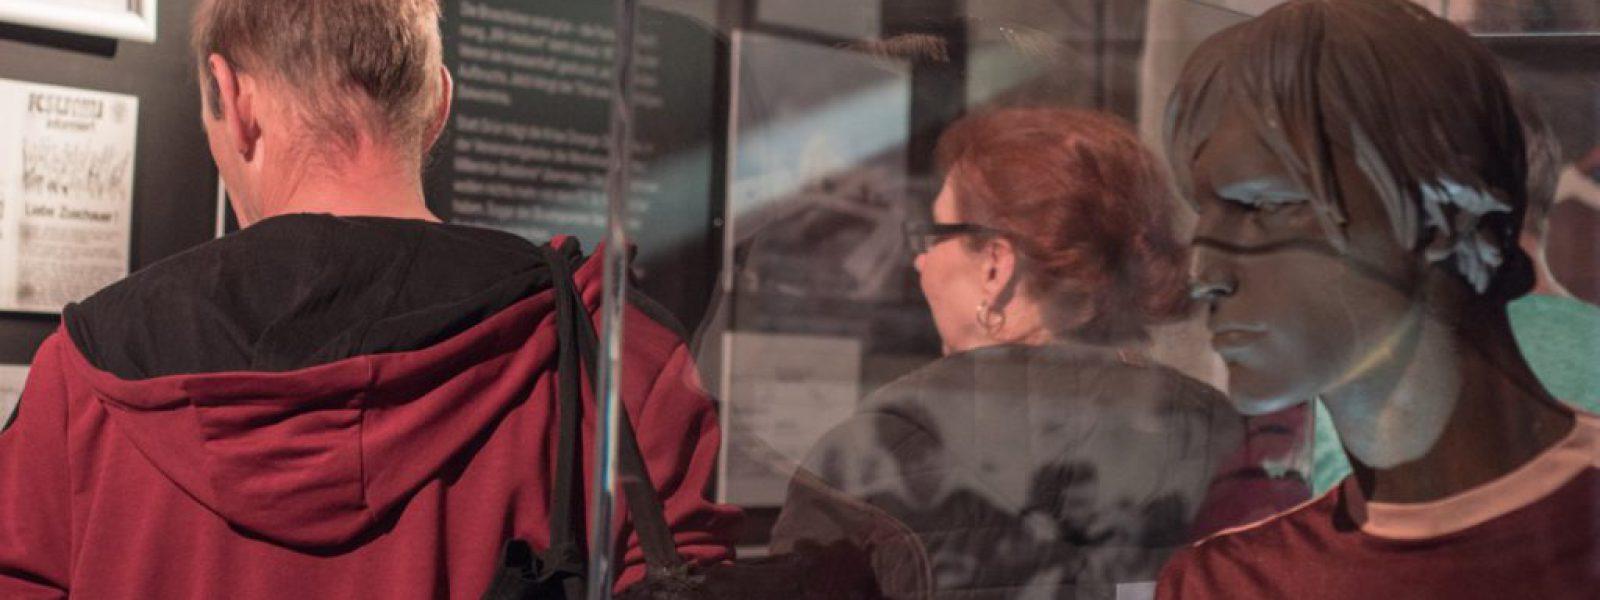 LNDM 2019 FCSPMuseum (Sabrina A Nagel) - 14